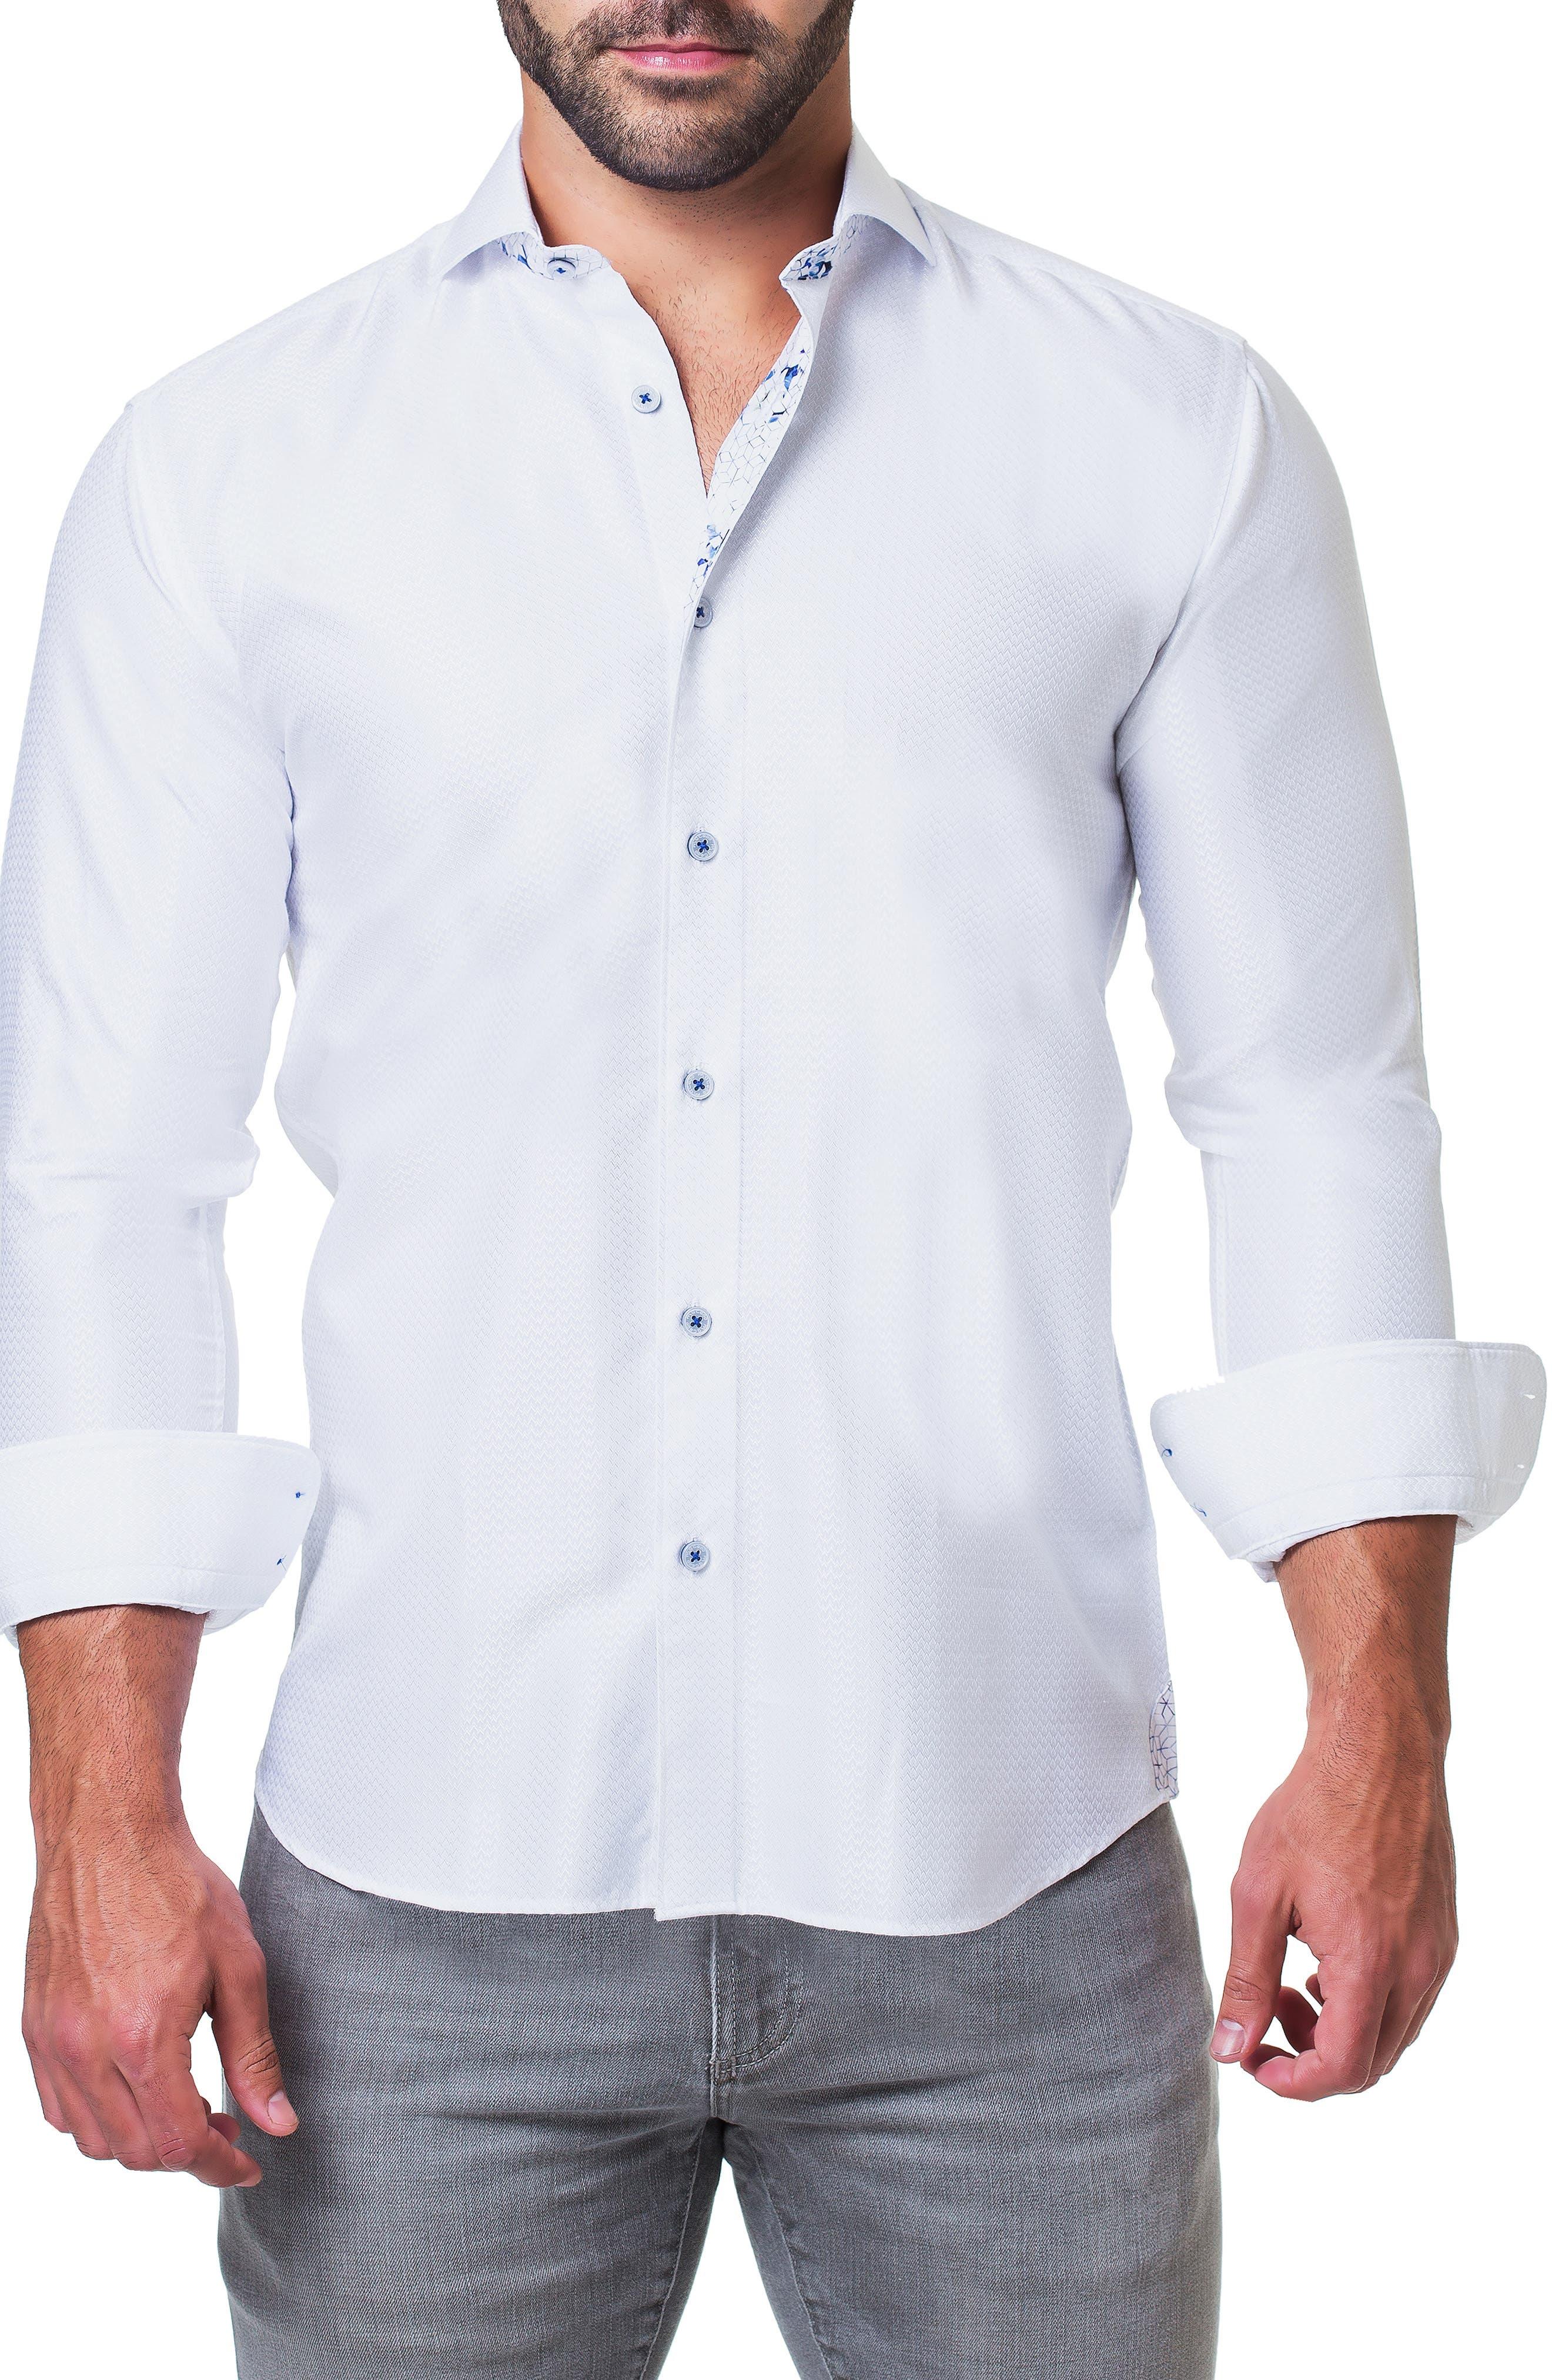 Einstein Ripple Trim Fit Sport Shirt,                             Alternate thumbnail 4, color,                             110